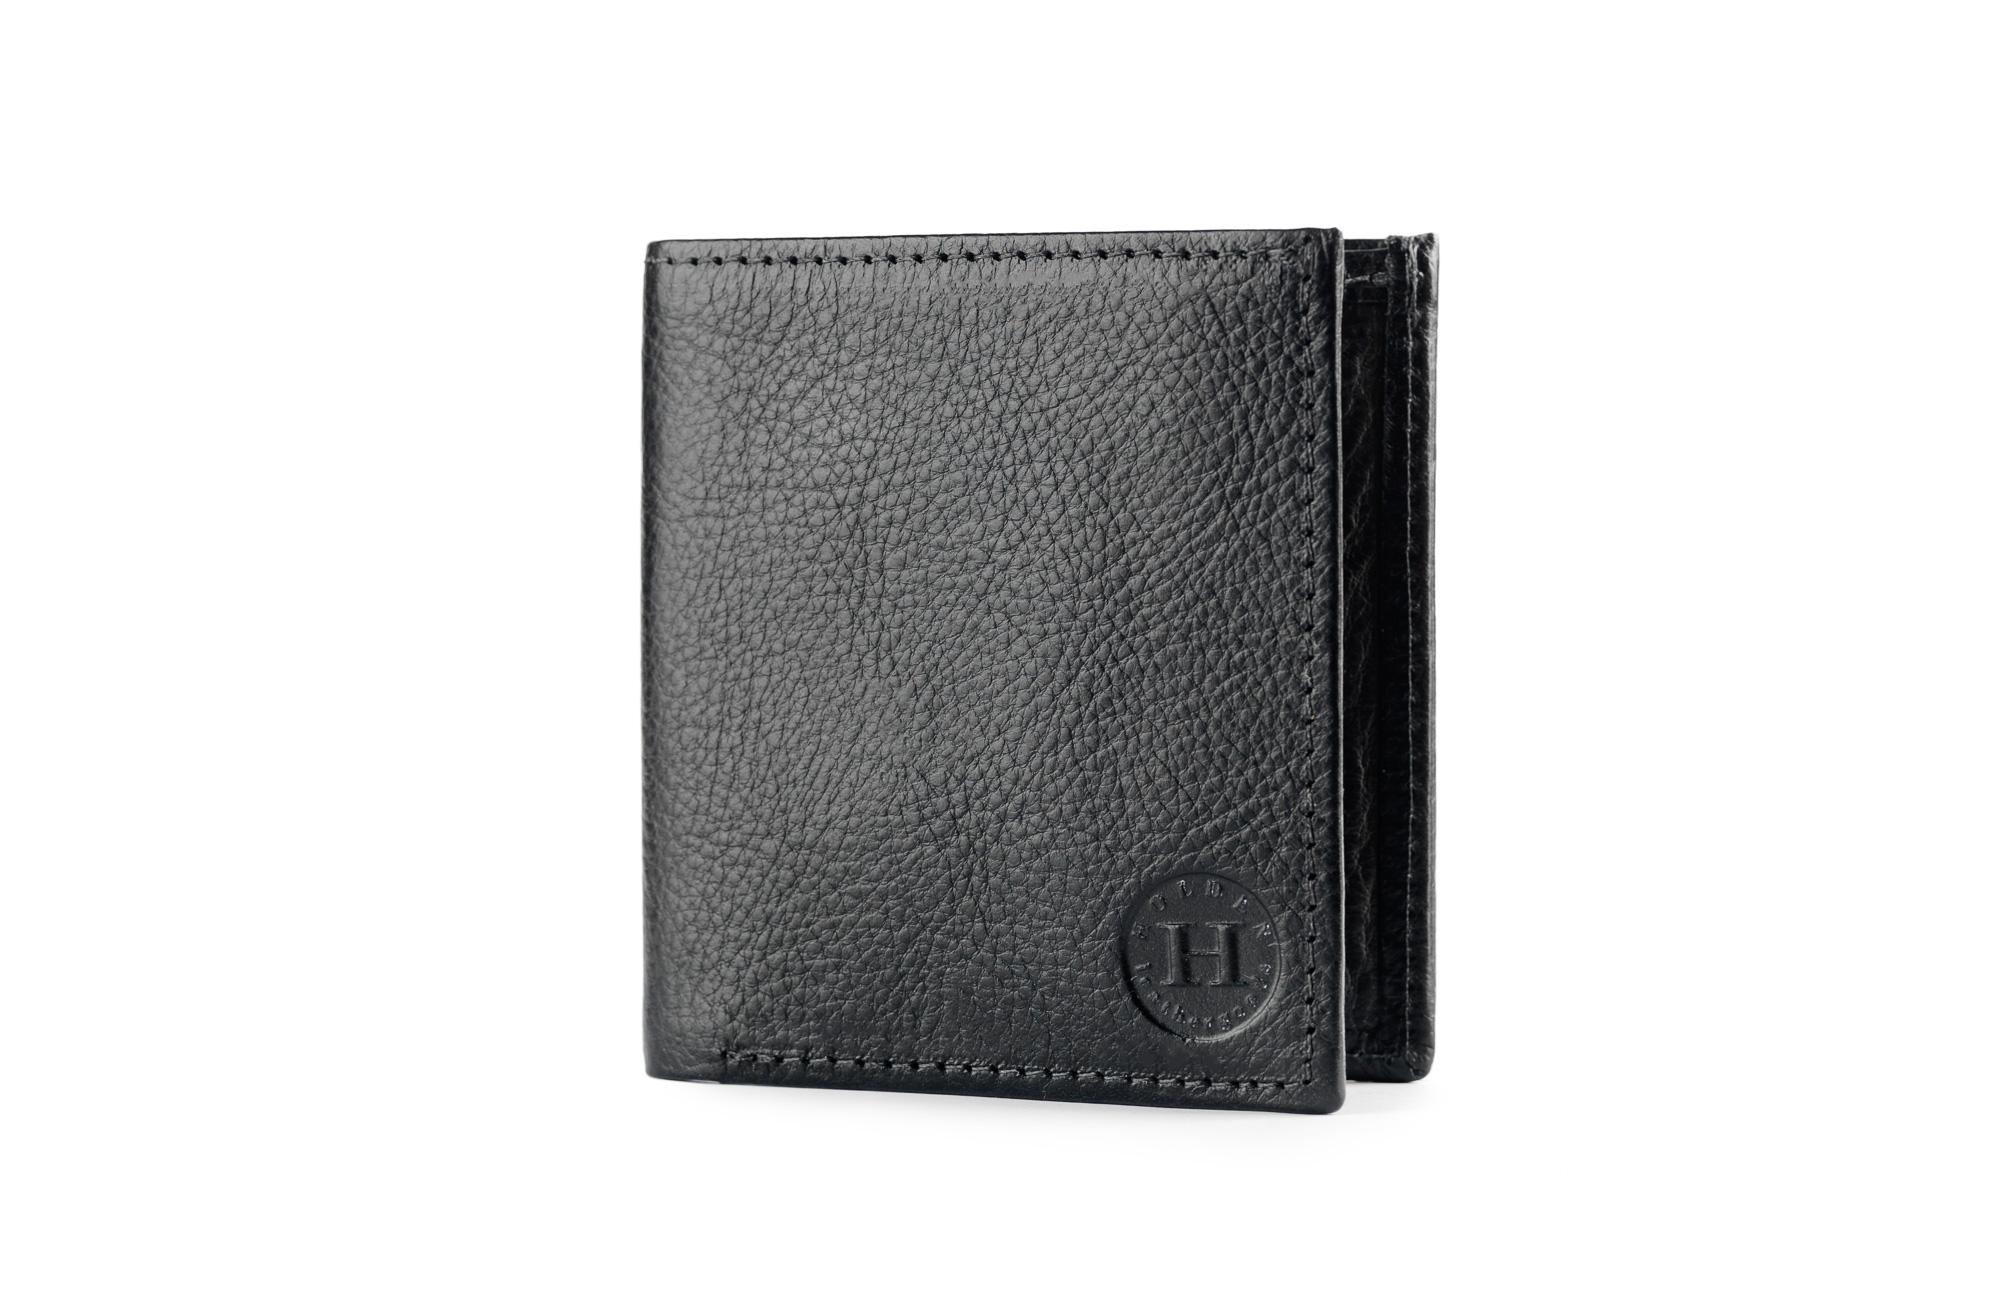 Holden 10 Card Wallet Black QC.jpg